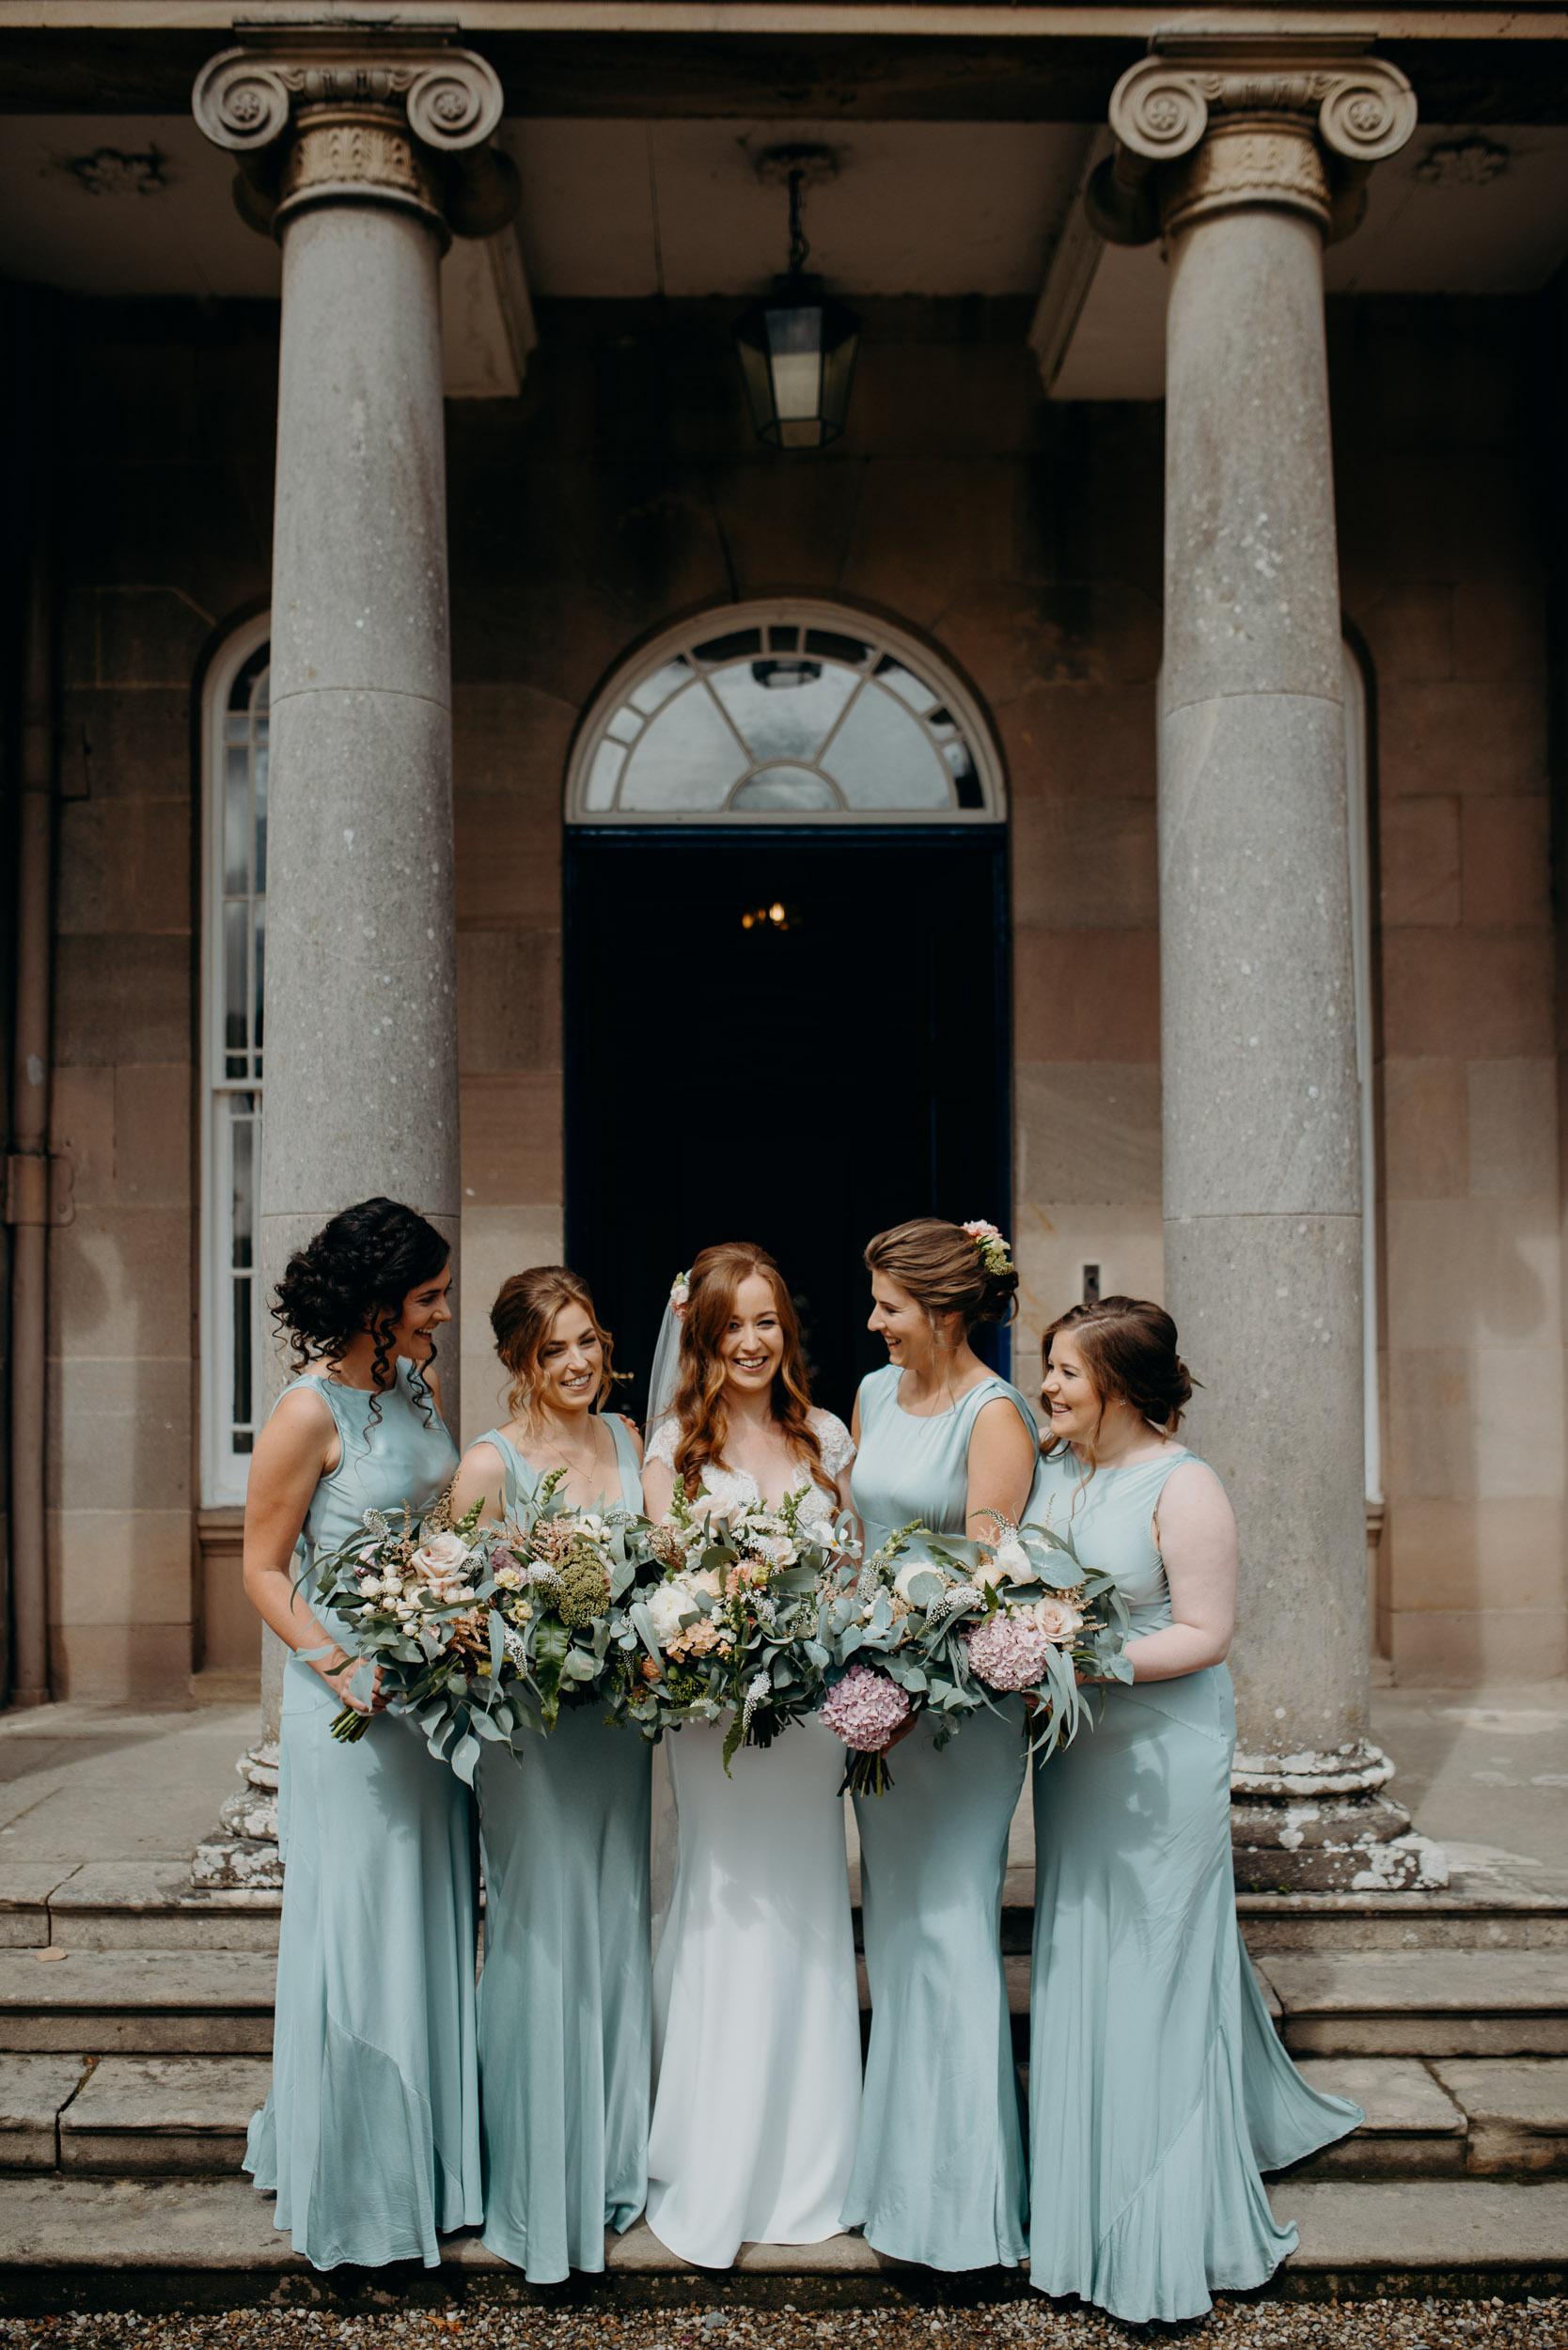 drenagh estate wedding photography-32.jpg